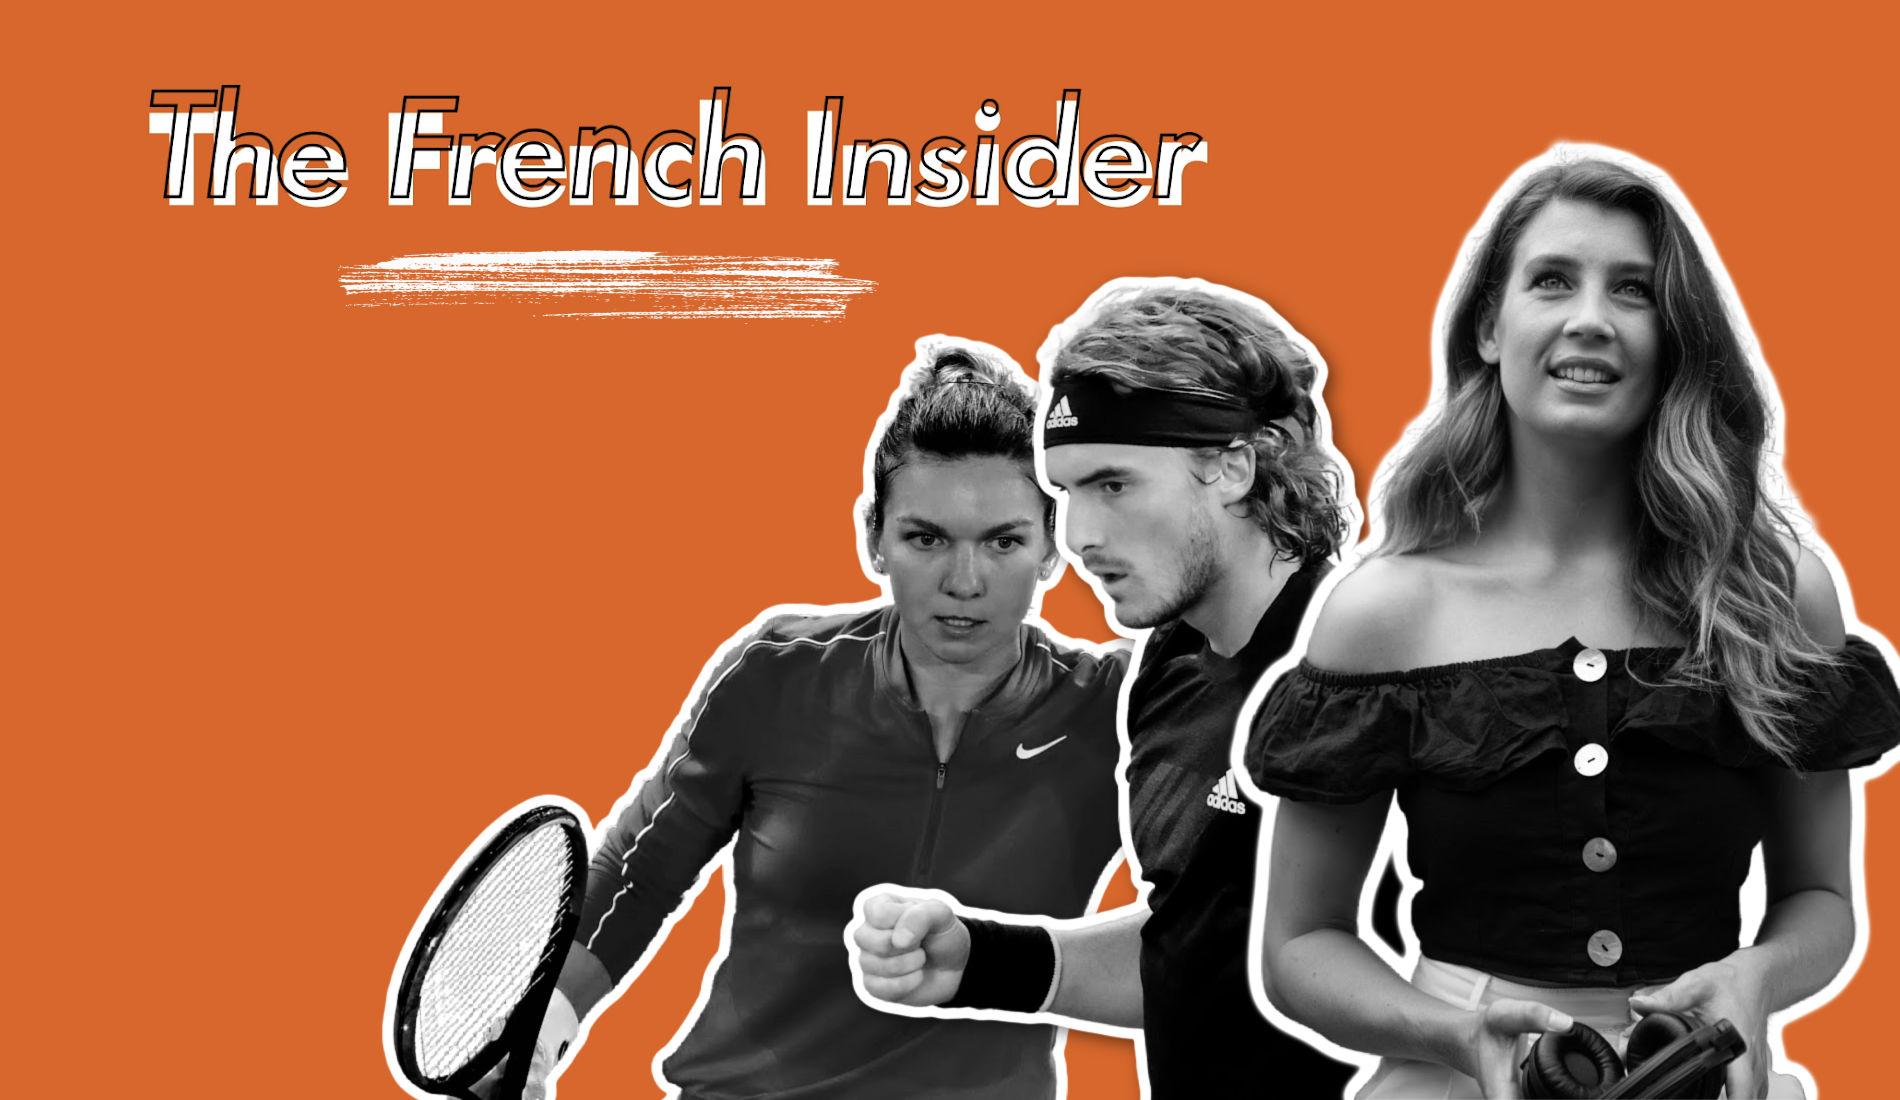 The French Insider #4, Simona Halep, Stefanos Tsitsipas and Jenny Drummond